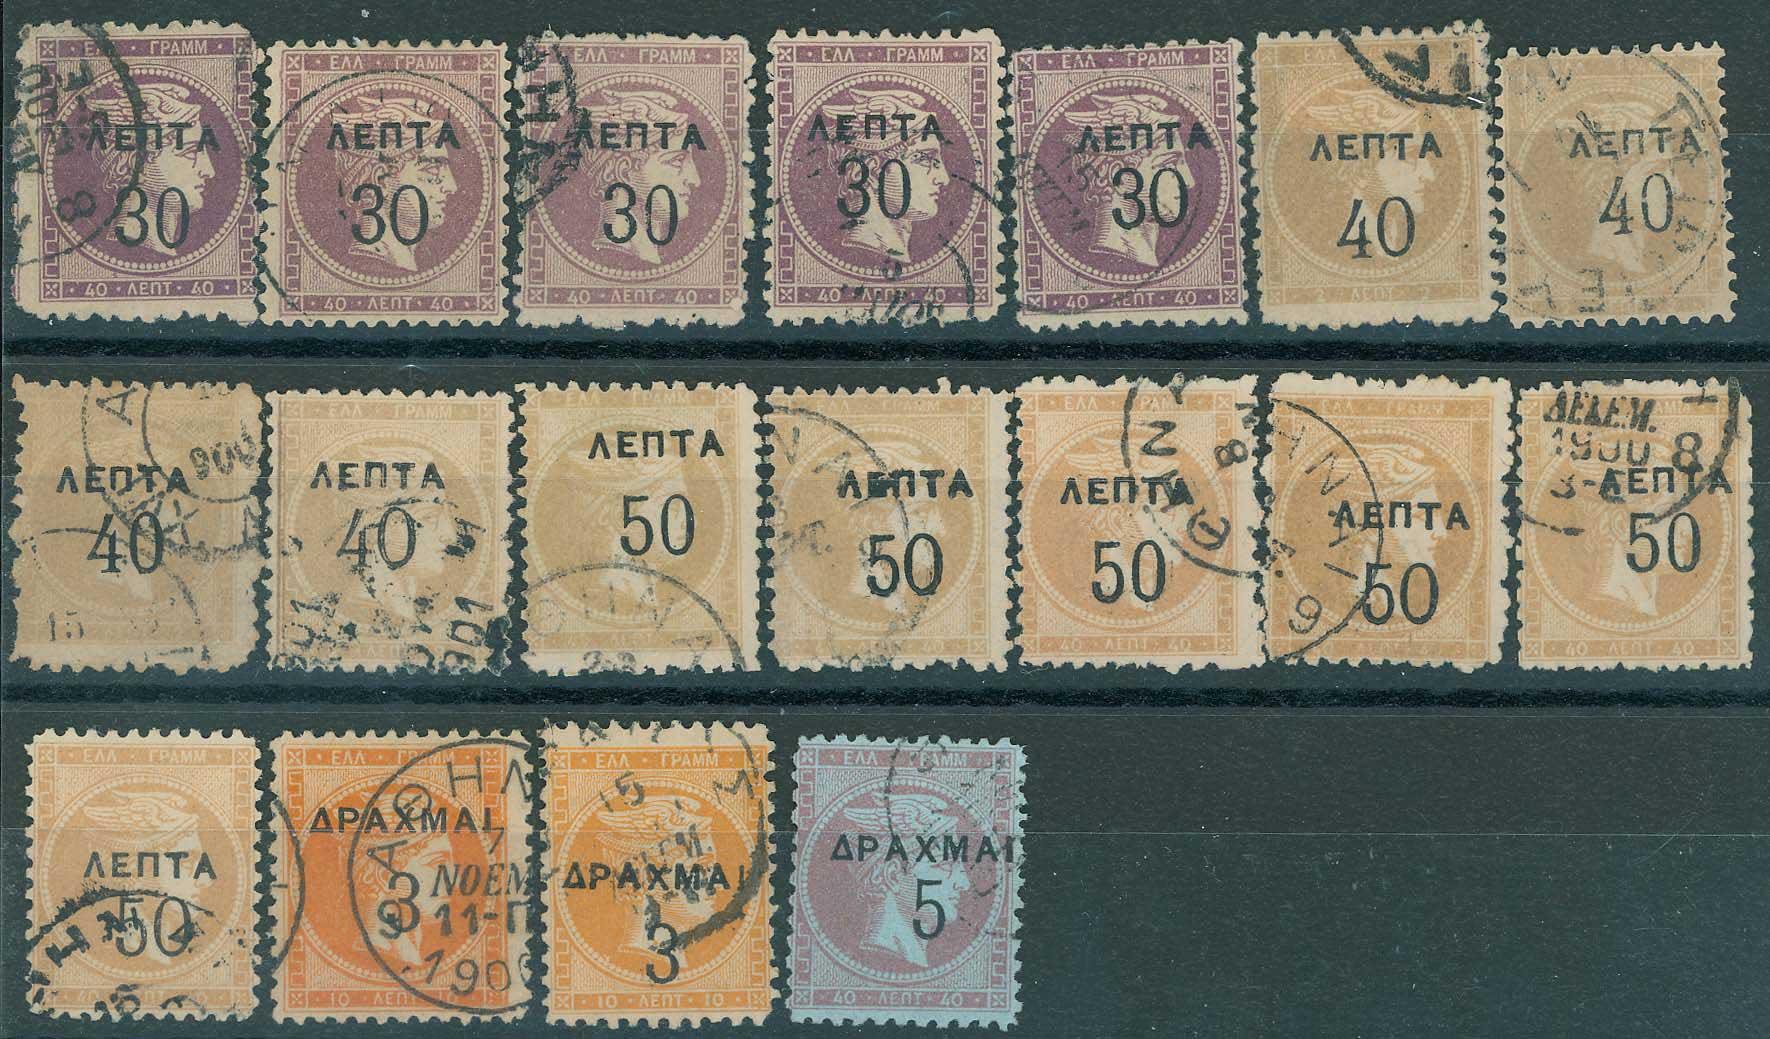 Lot 388 - -  OVERPRINTS ON HERMES HEADS & 1896 OLYMPICS OVERPRINTS ON HERMES HEADS & 1896 OLYMPICS -  A. Karamitsos Public & Live Internet Auction 675